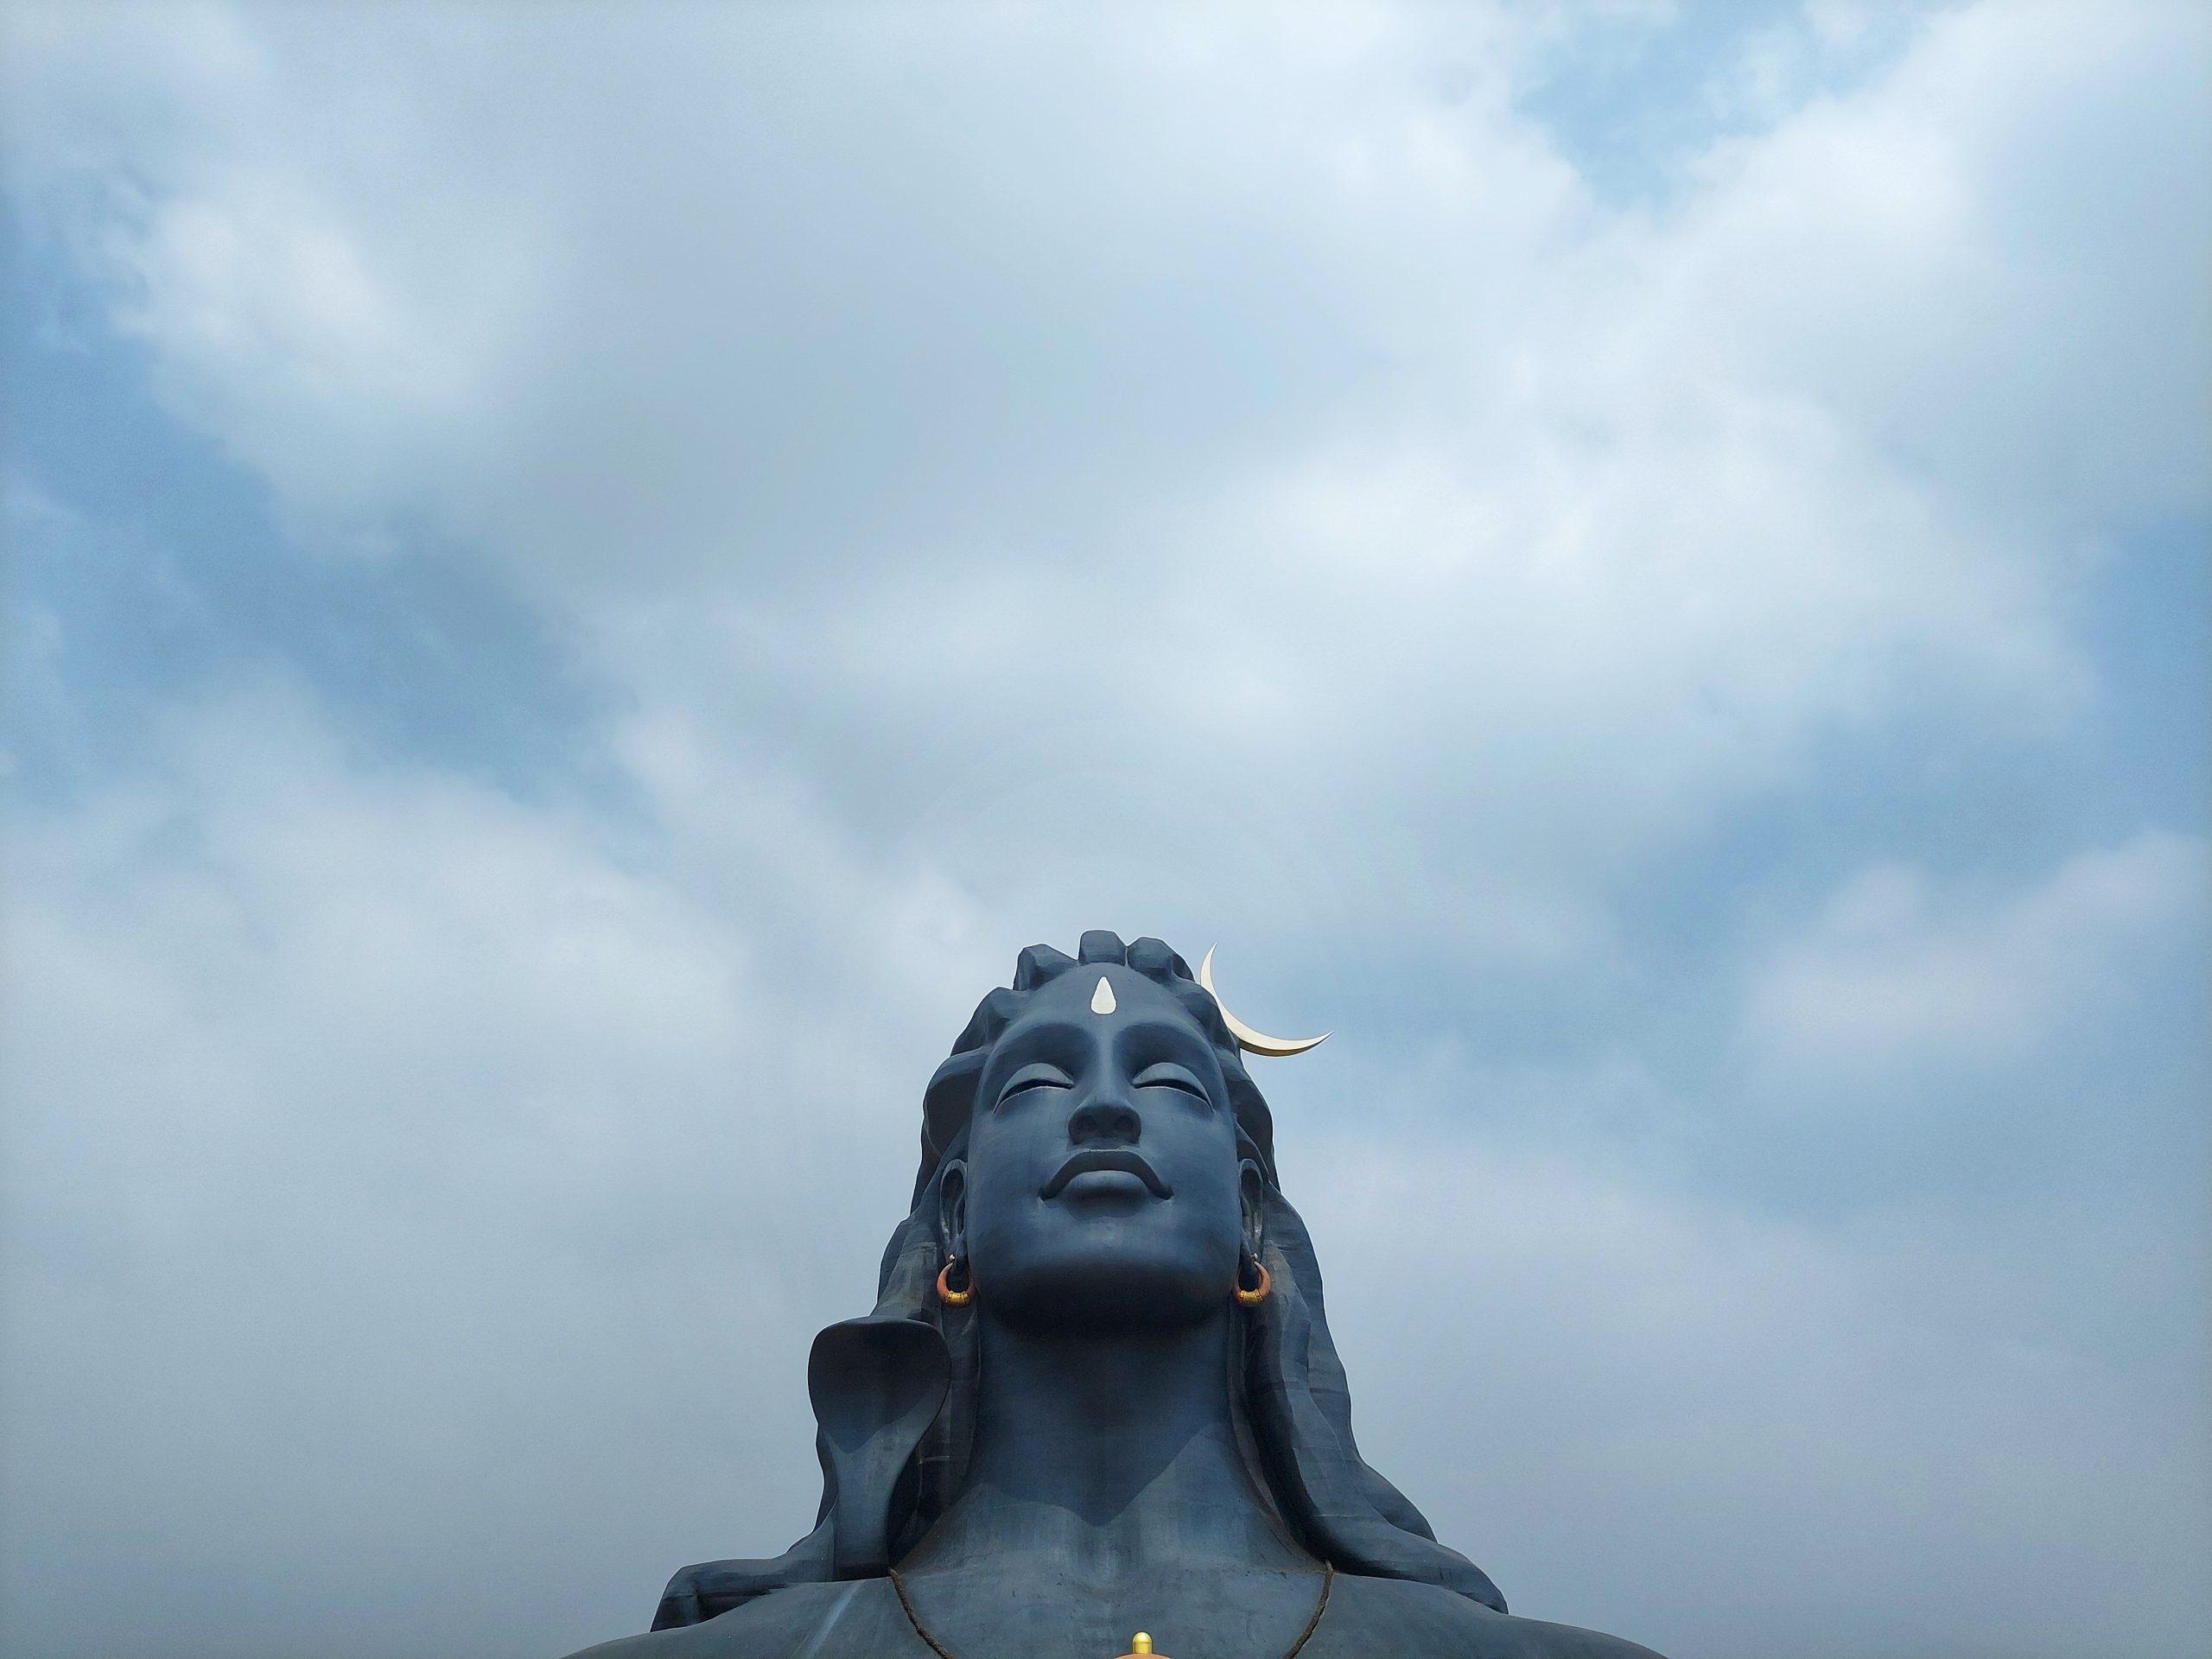 Lord Shiva statue Coimbatore